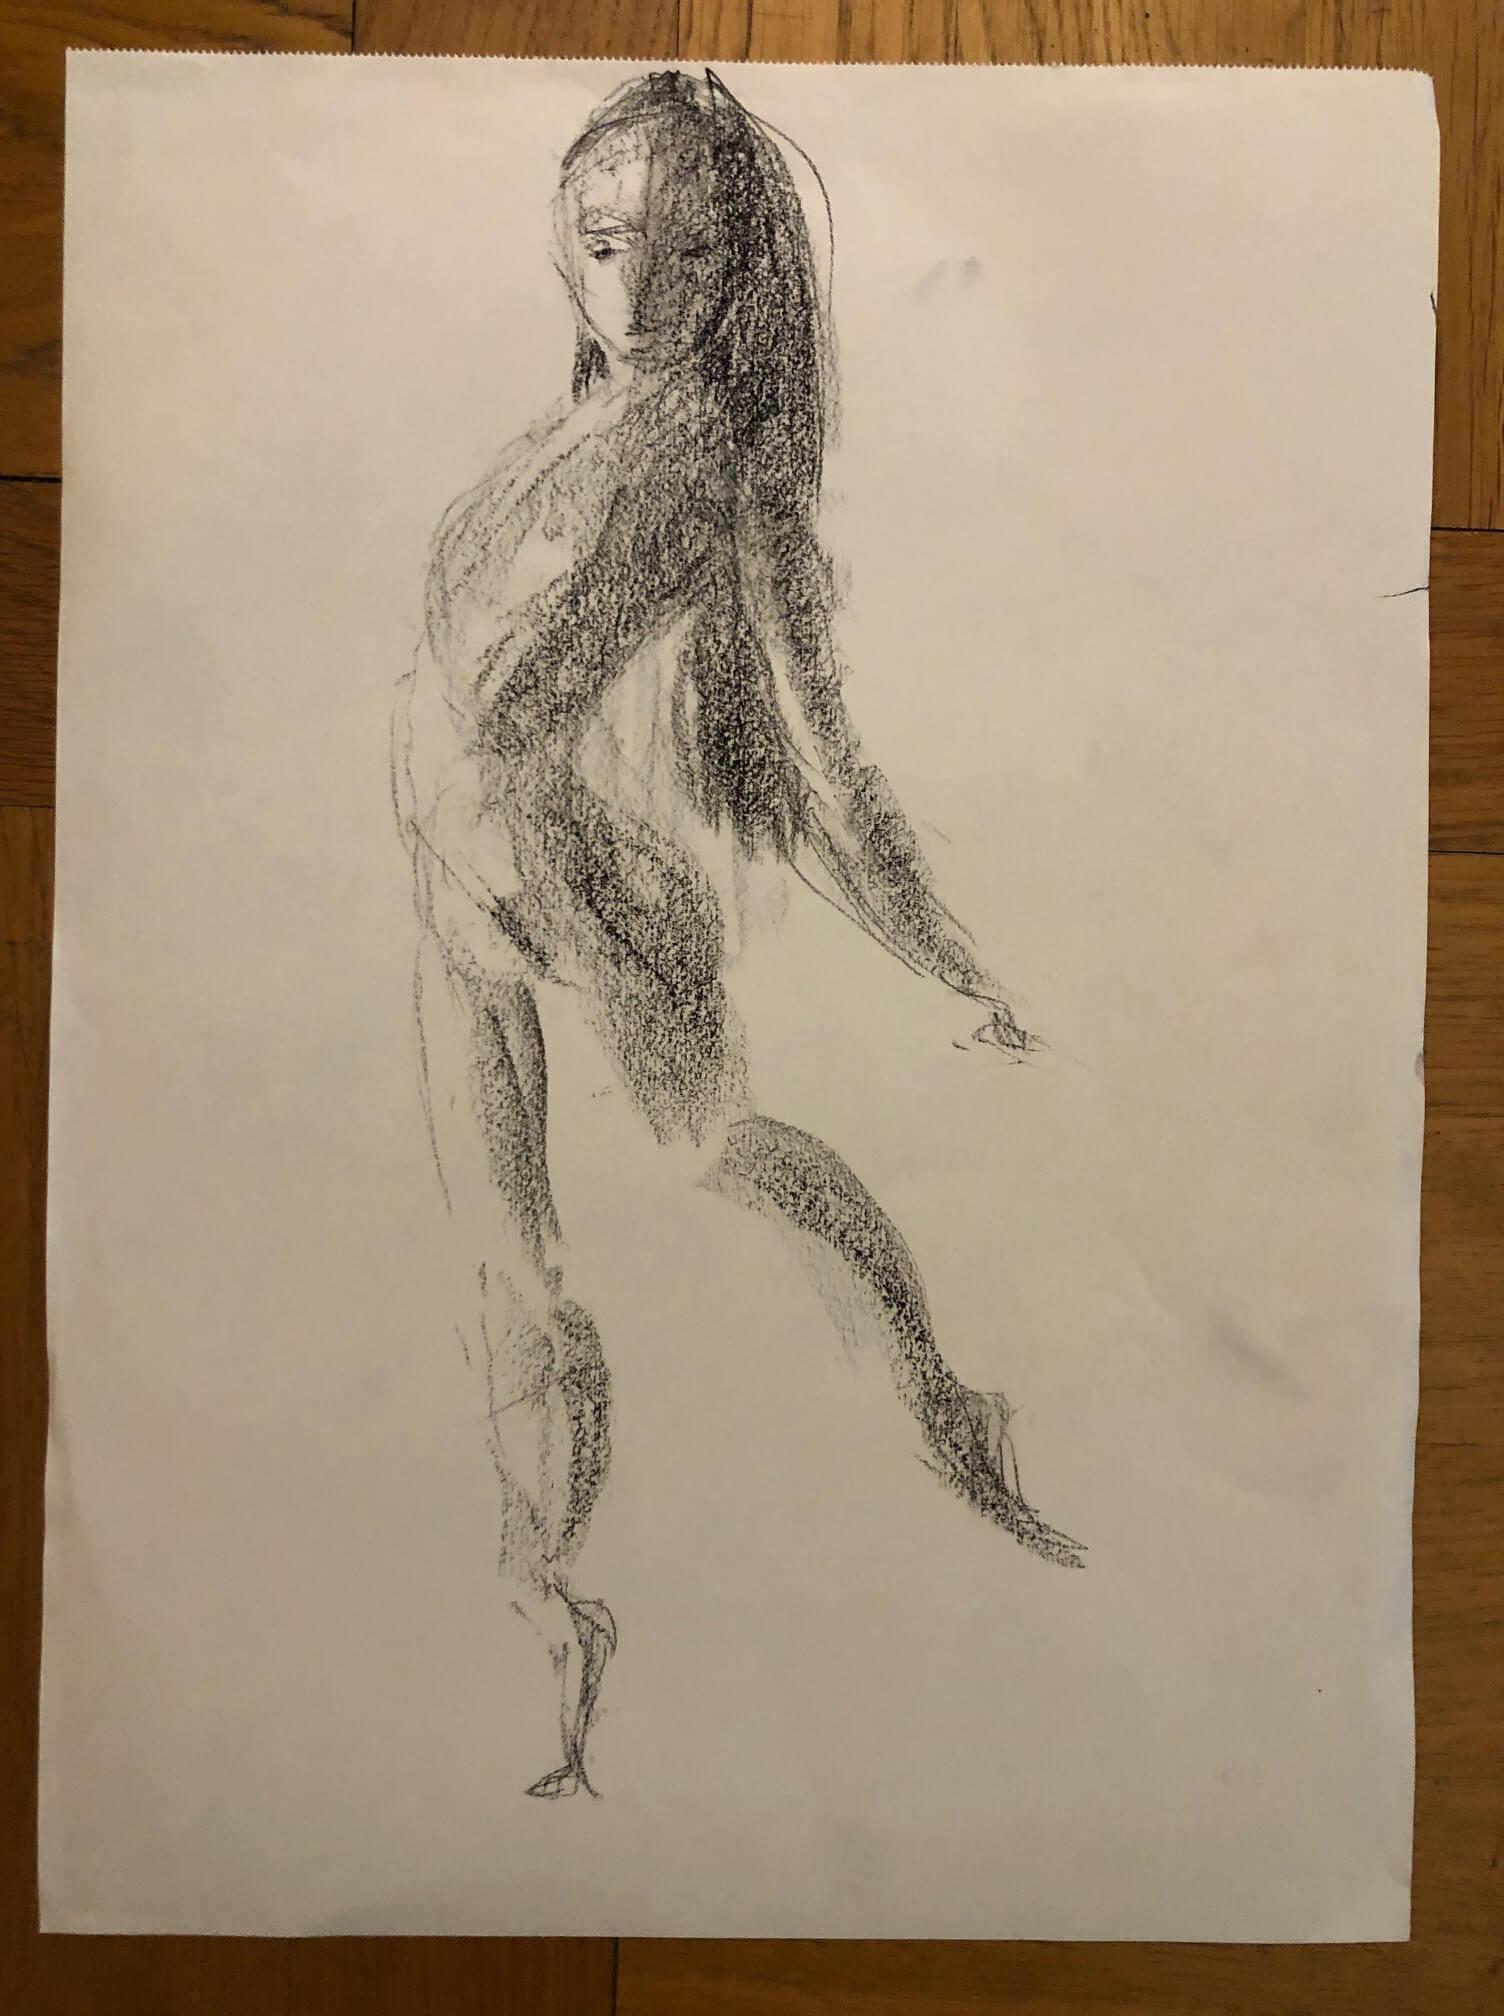 Dessin danseuse femme fusain  cours de dessin